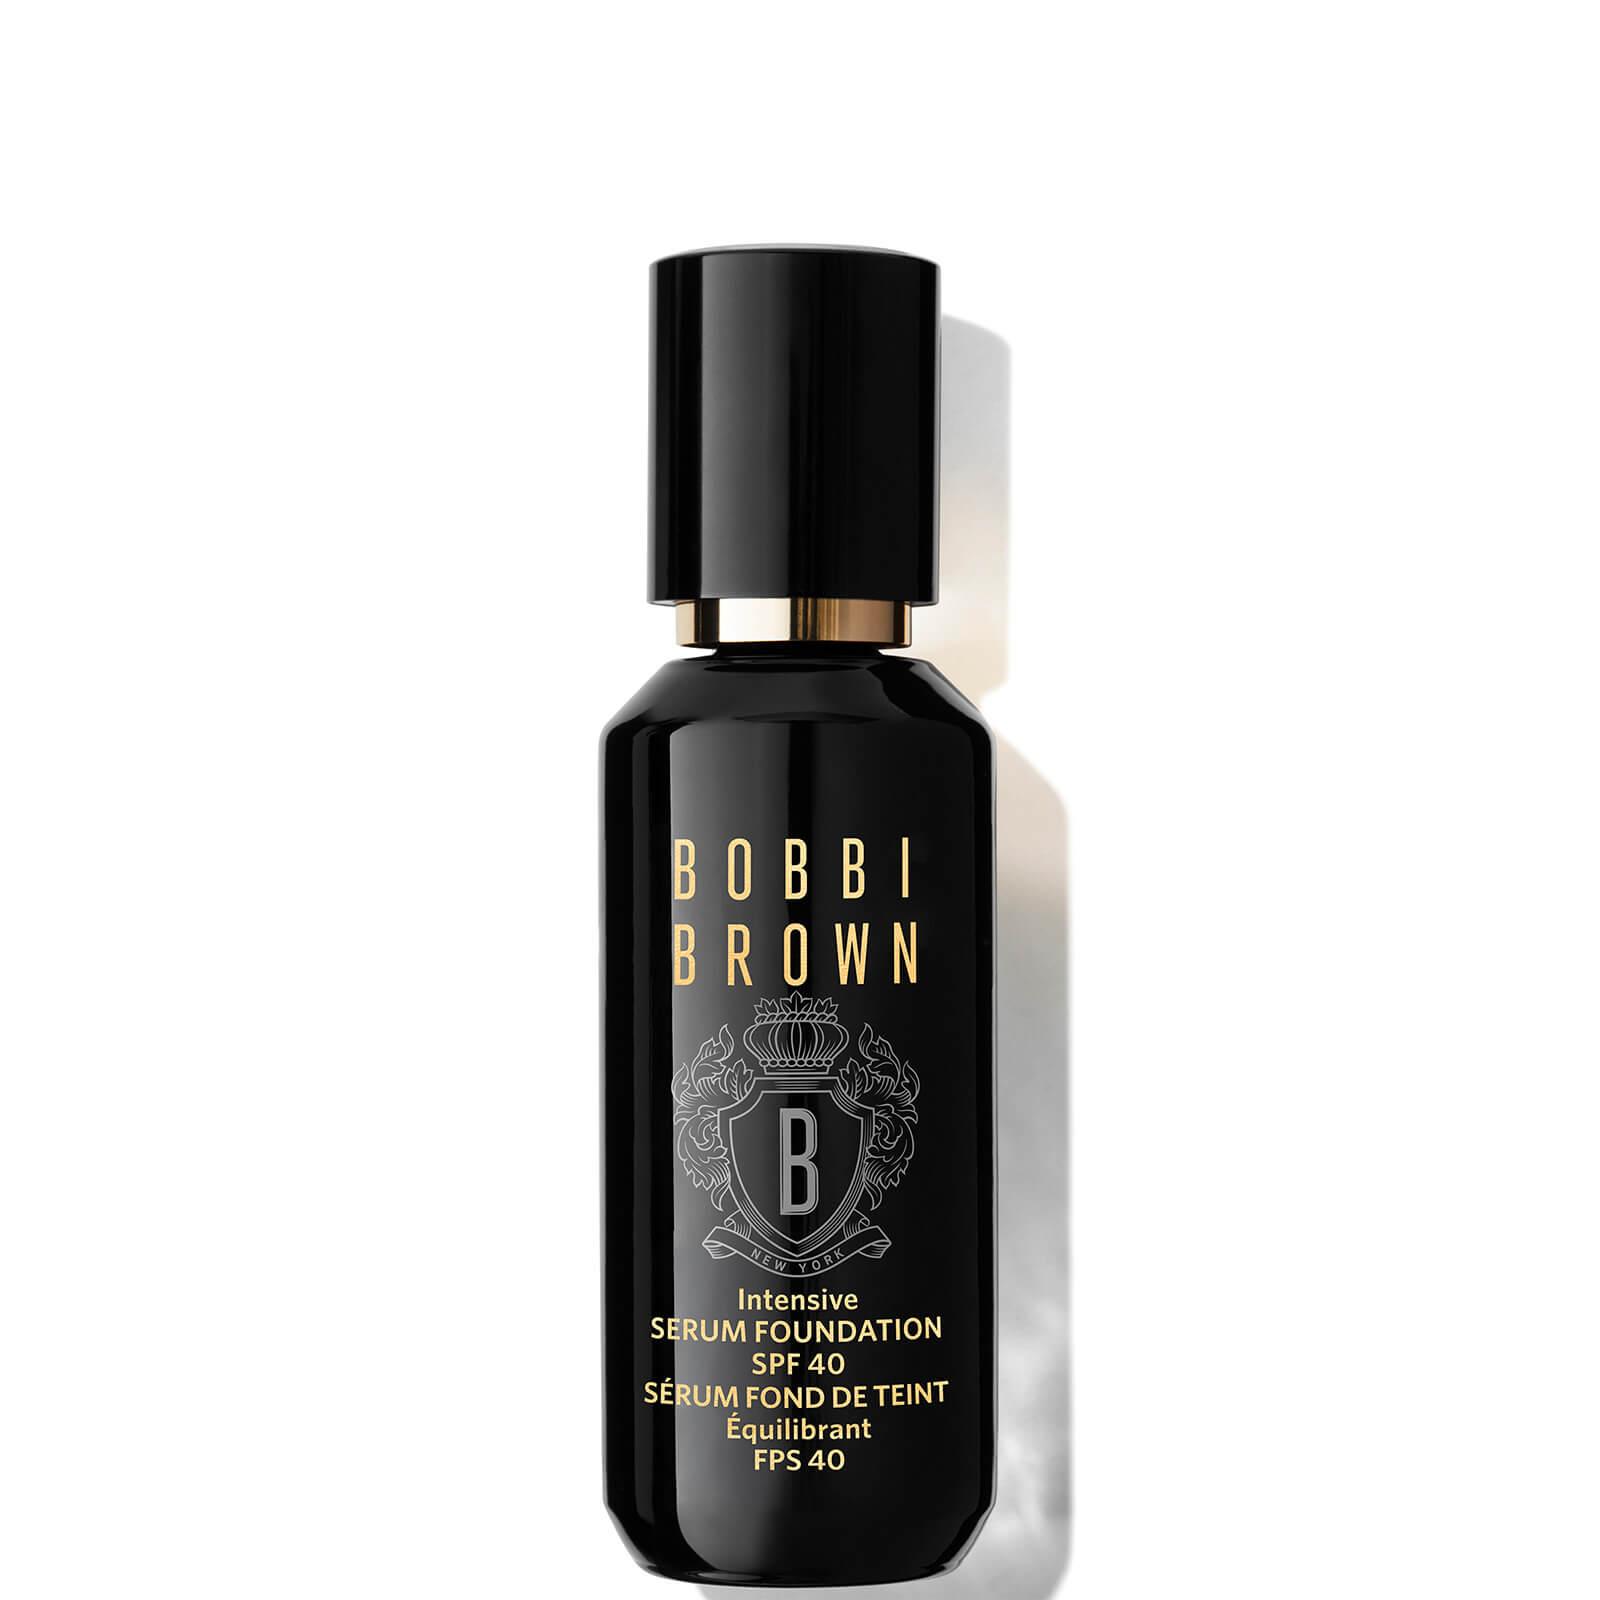 Bobbi Brown Intensive Serum Foundation SPF40 30ml (Various Shades) - Alabaster